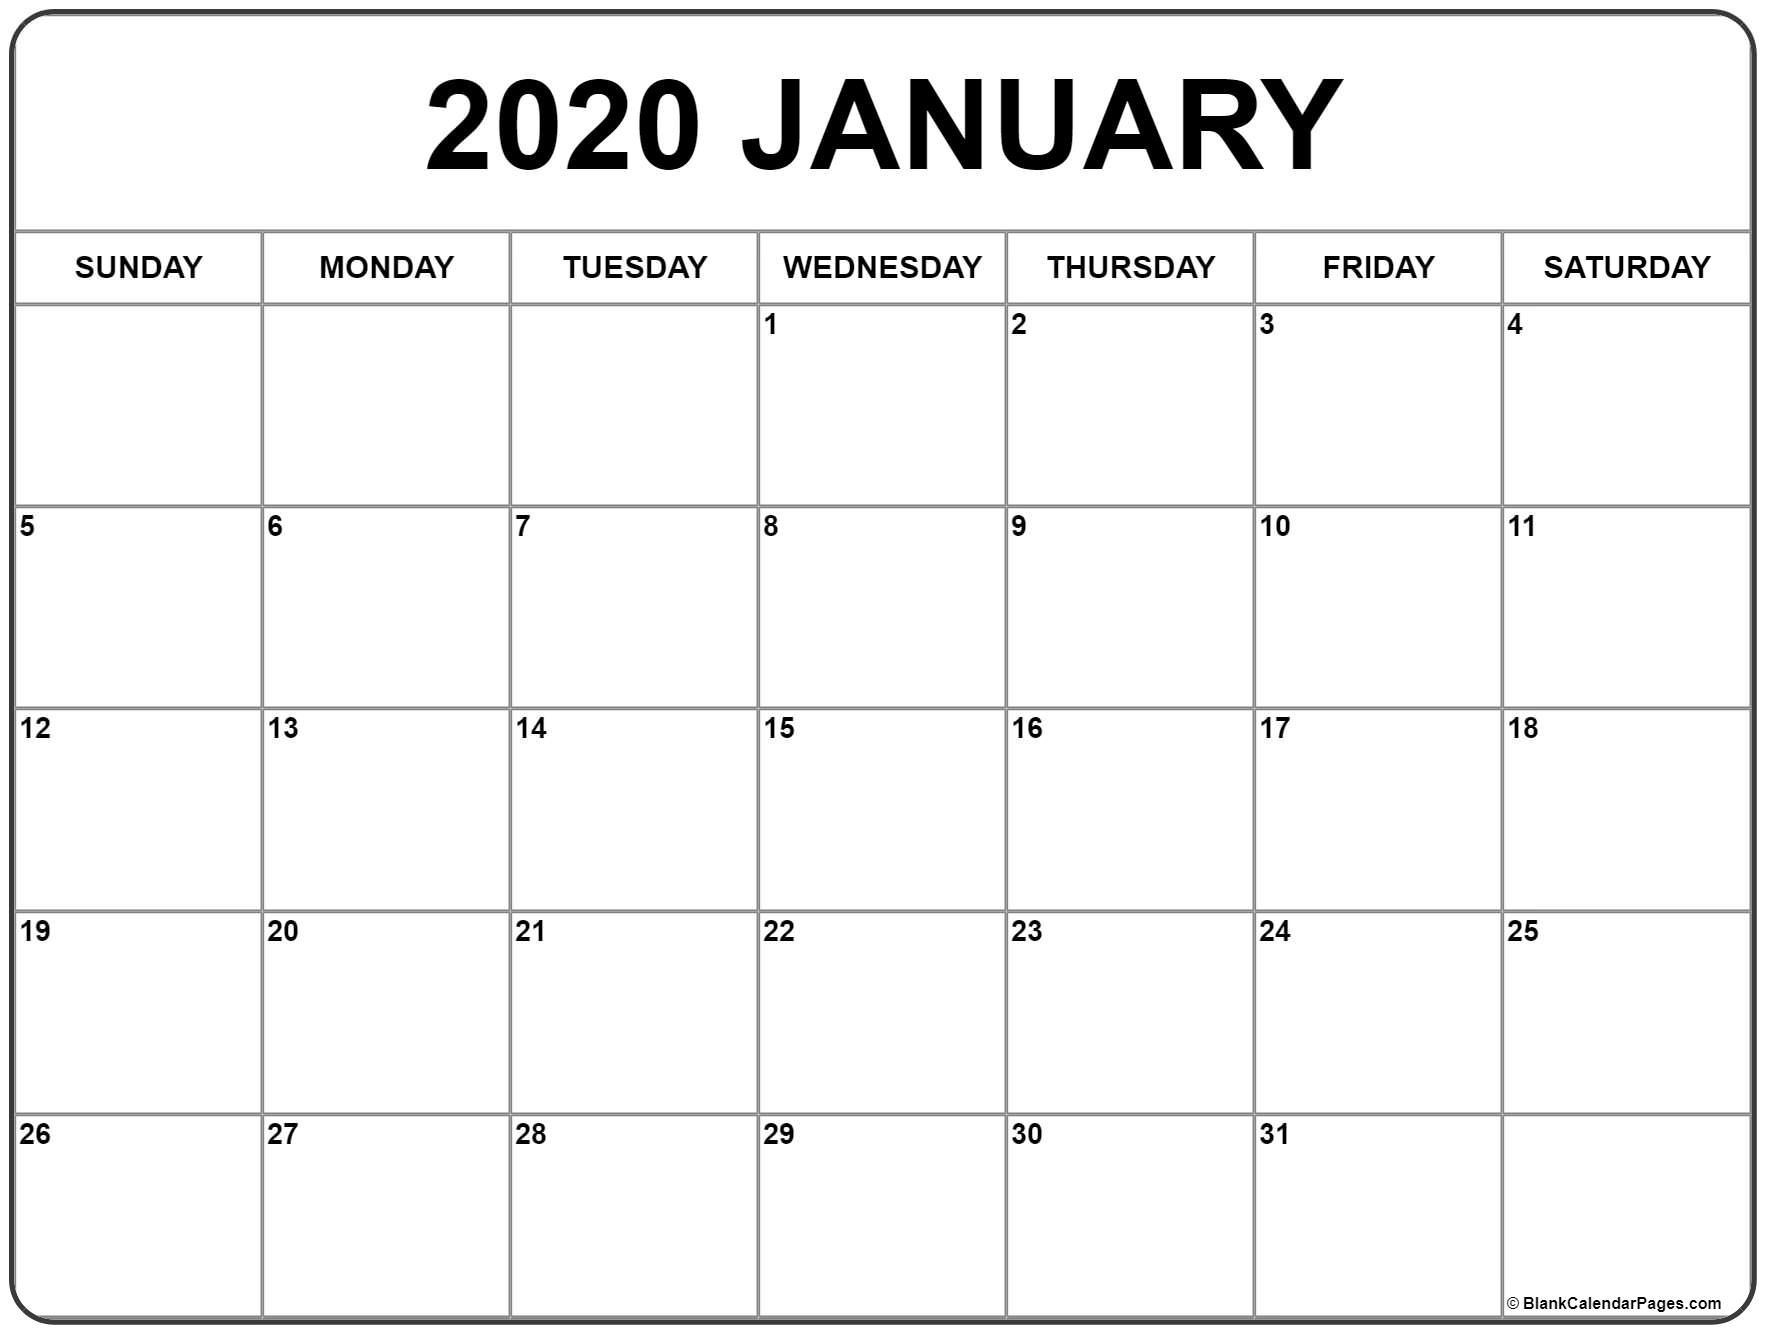 January 2020 Calendar | Free Printable Monthly Calendars  February Blank Calendar Printable